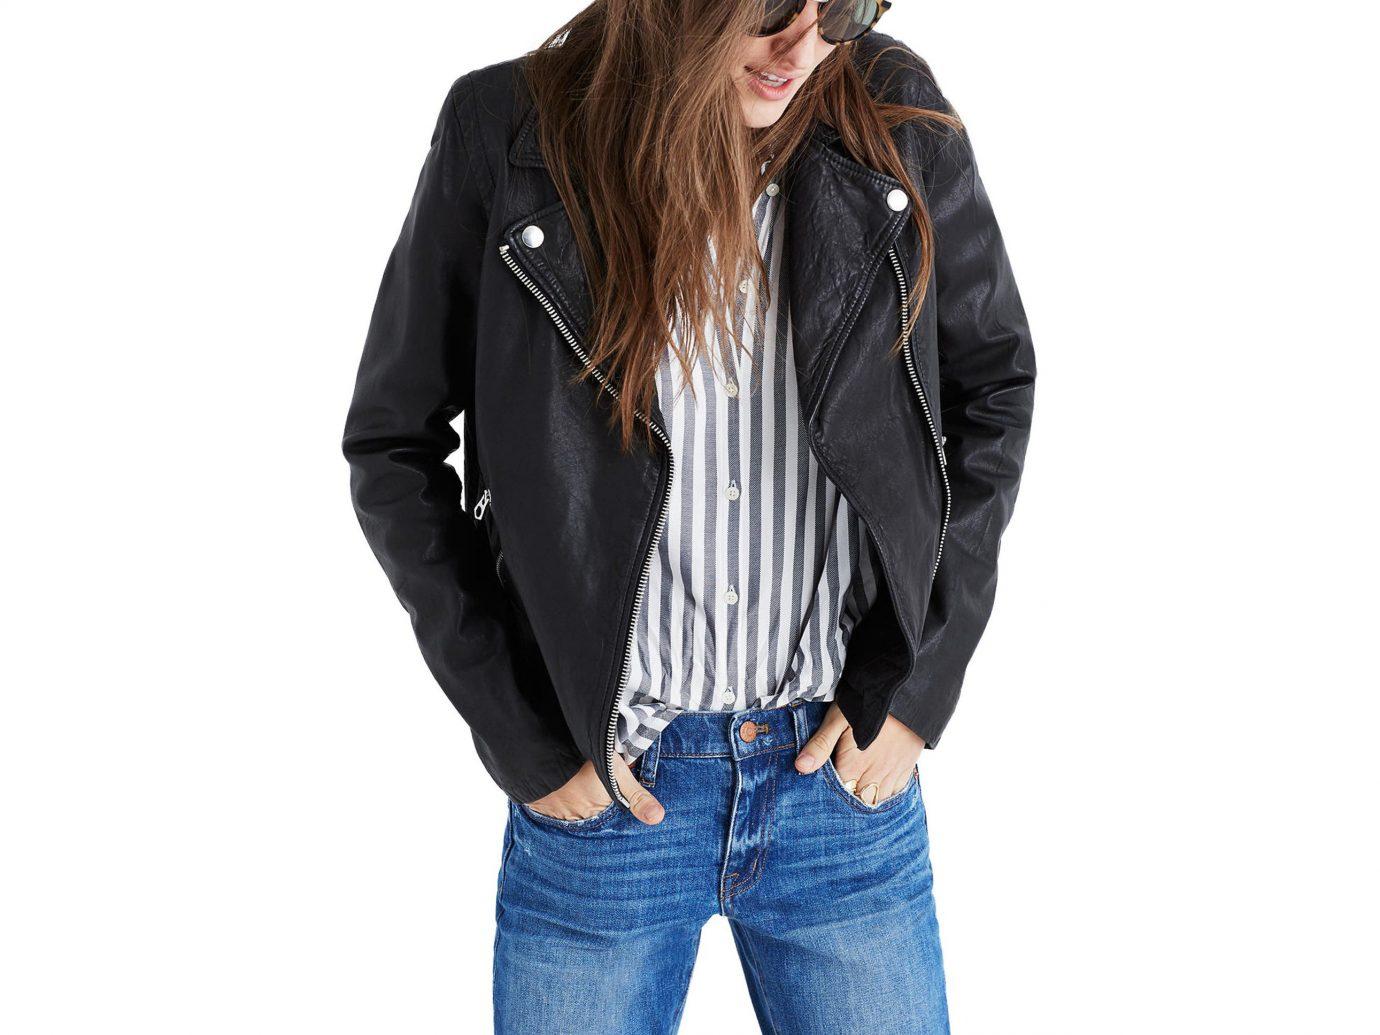 Travel Shop person jacket leather jacket wearing standing leather jeans sleeve hood zipper denim posing hoodie